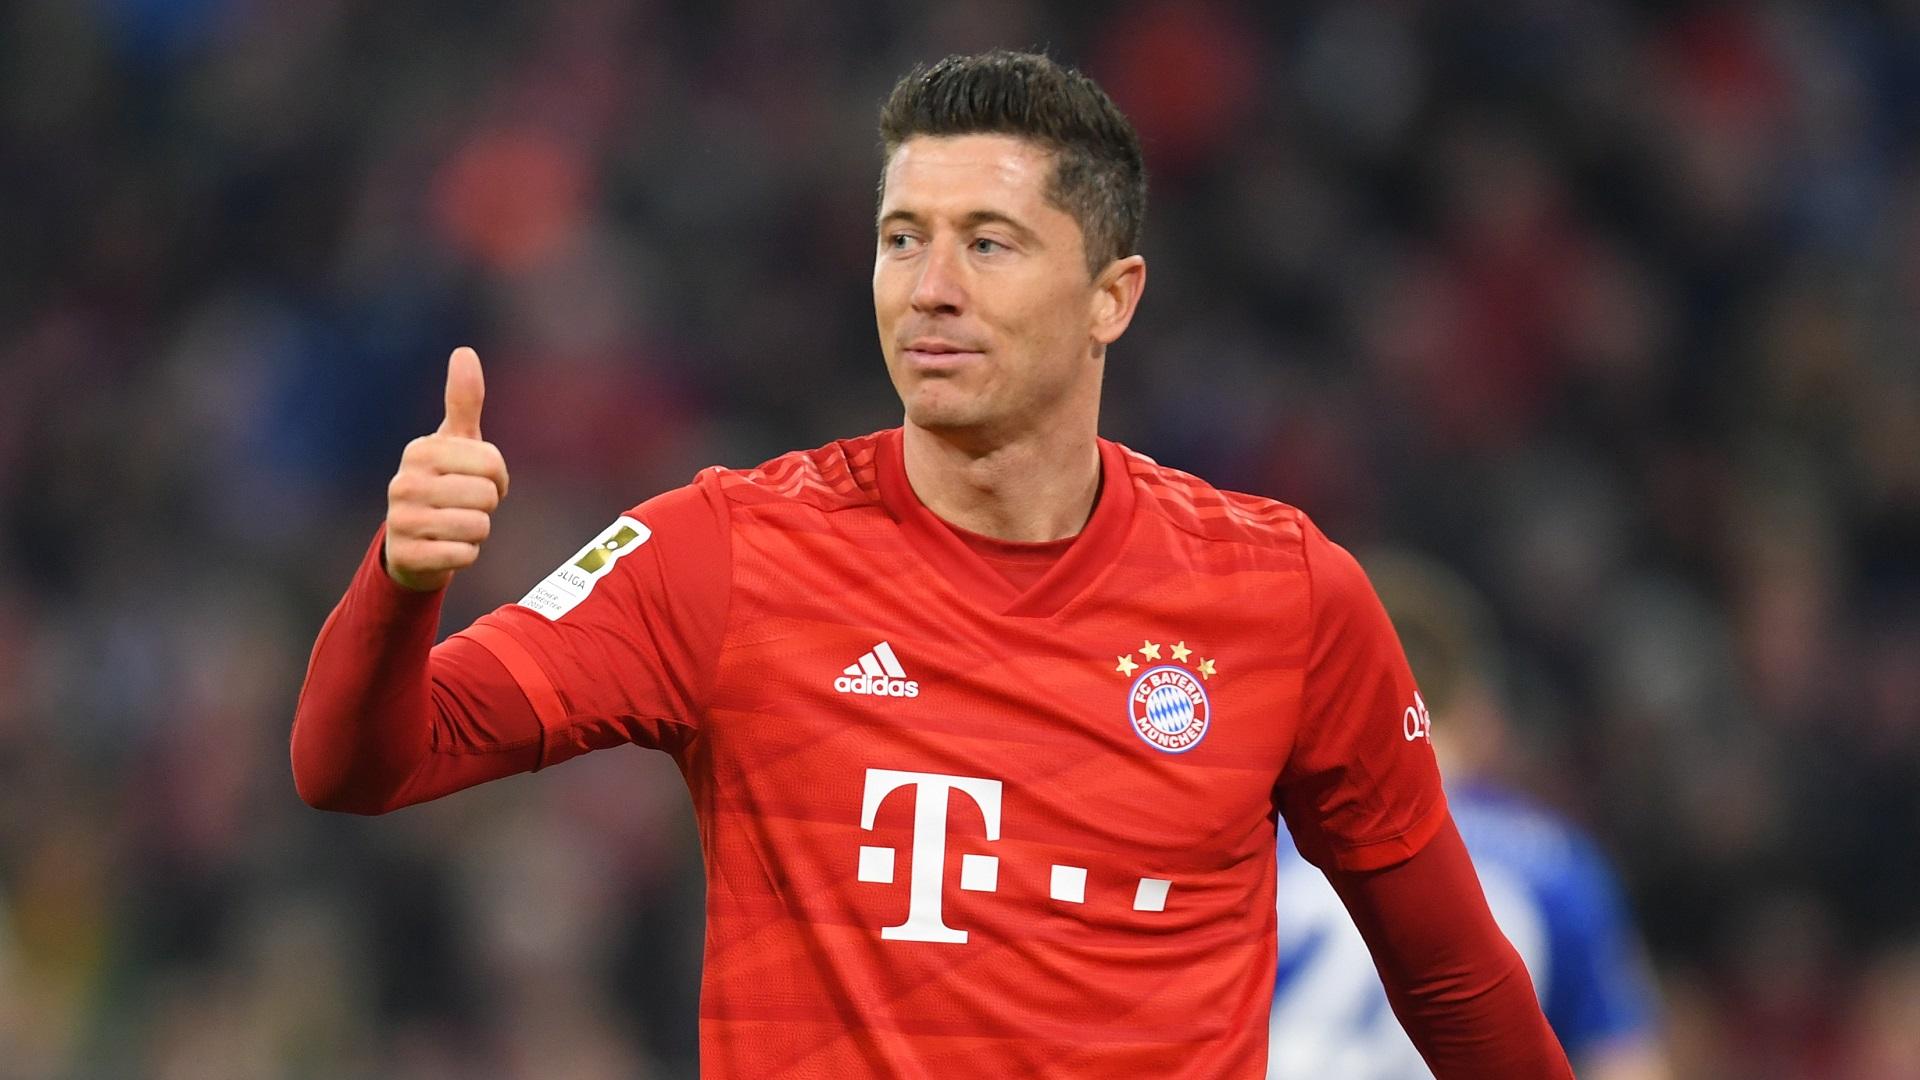 'Lewandowski is a complete striker' - Defenders have 'no advantage' against Bayern star, says his former team-mate Kirchhoff